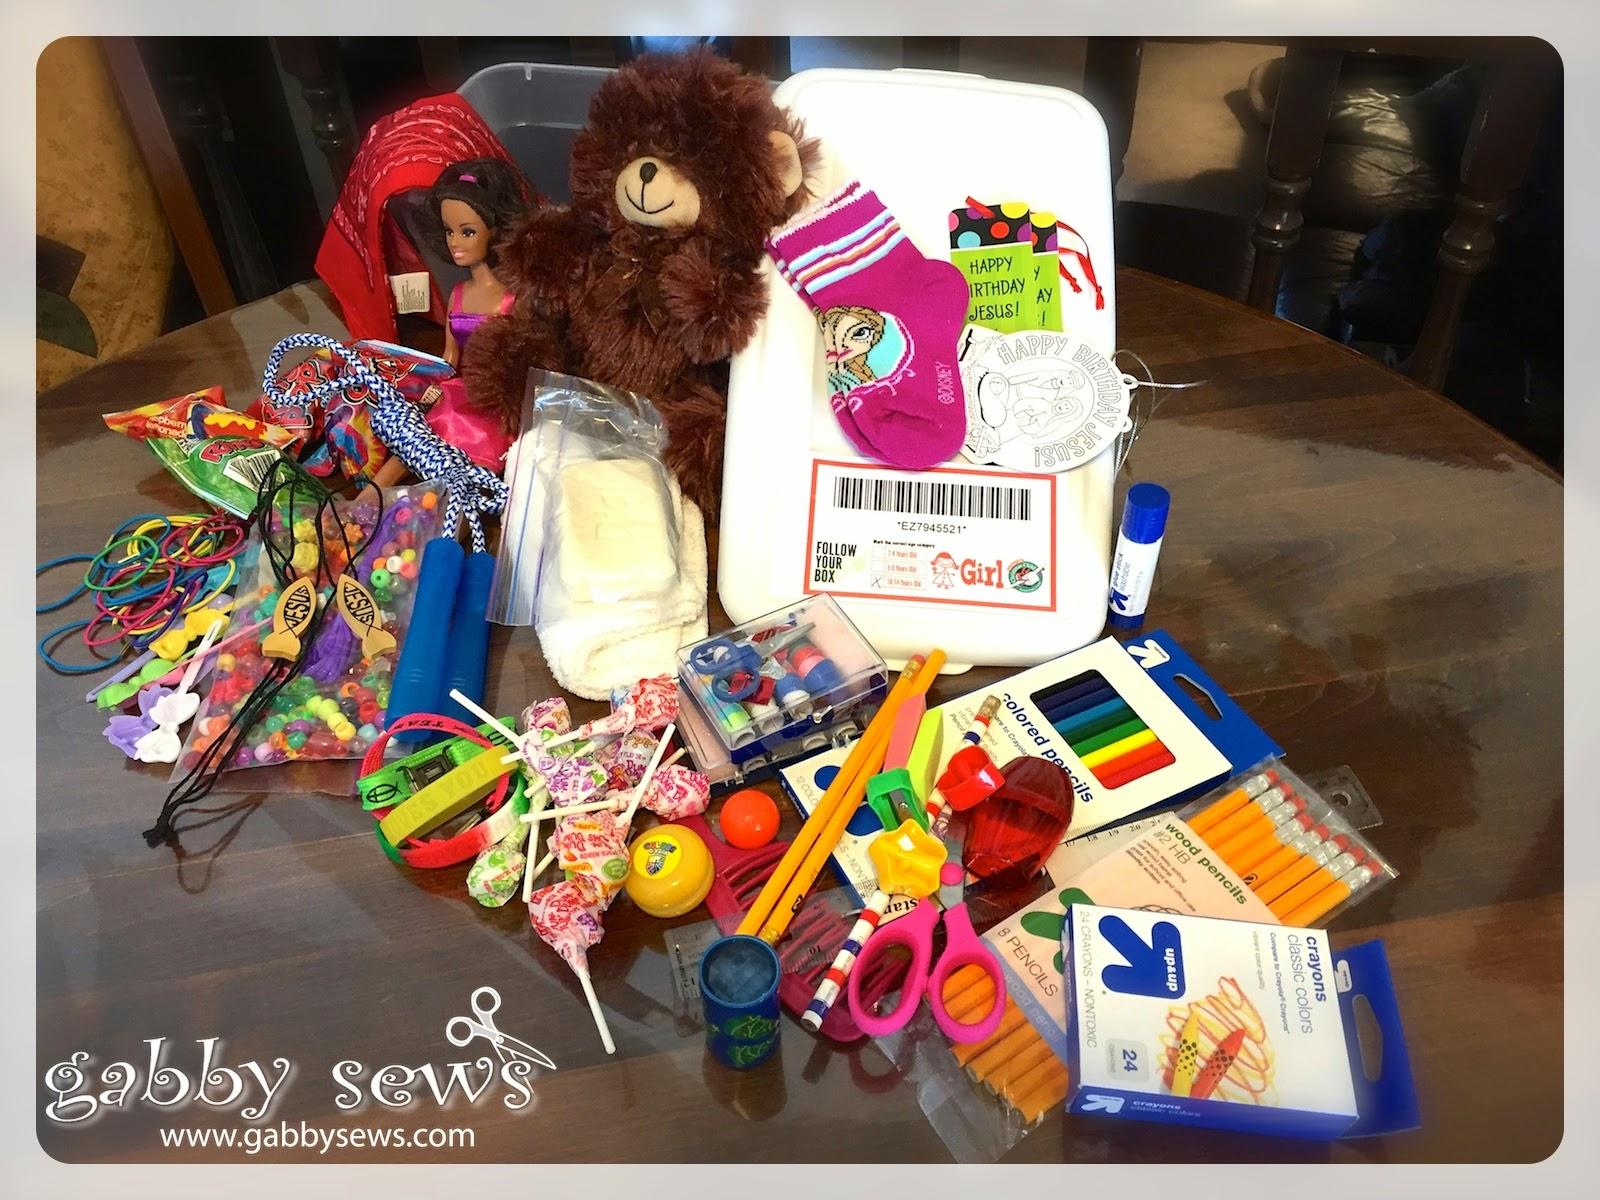 Operation Christmas Child Logo Svg.Gabby Sews Operation Christmas Child Packing Tips And Ideas